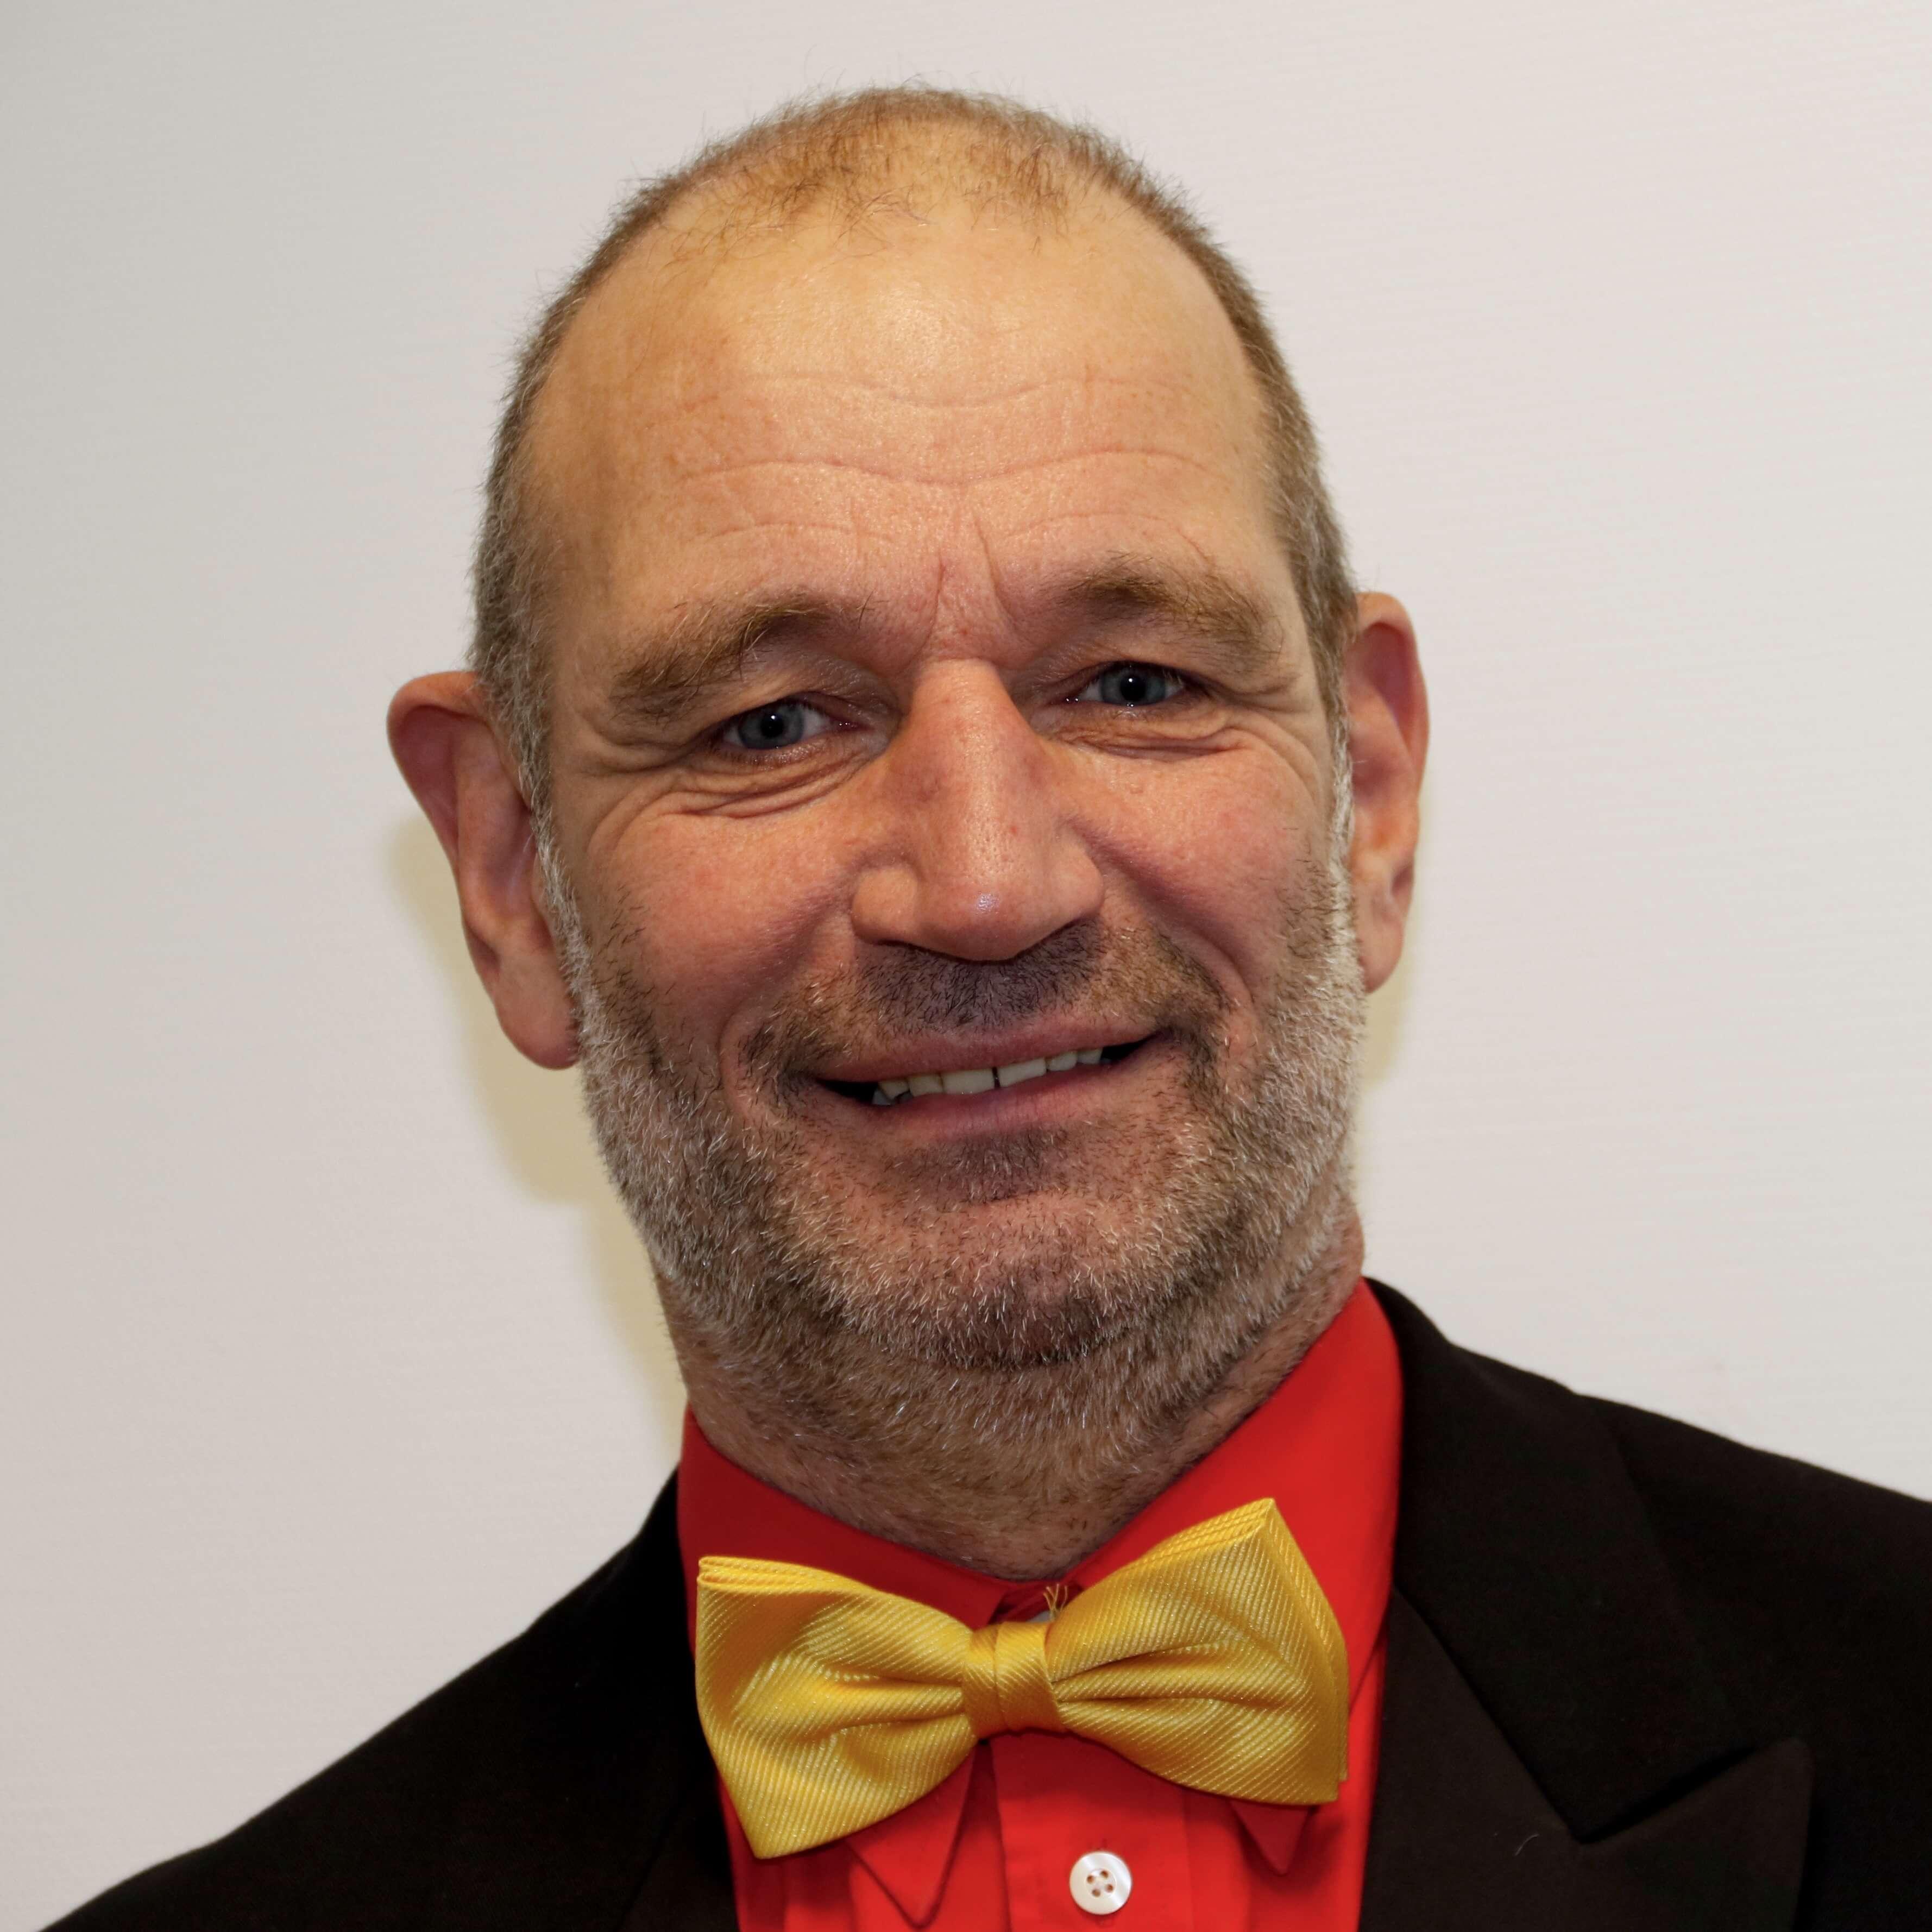 Jan Couwenberg